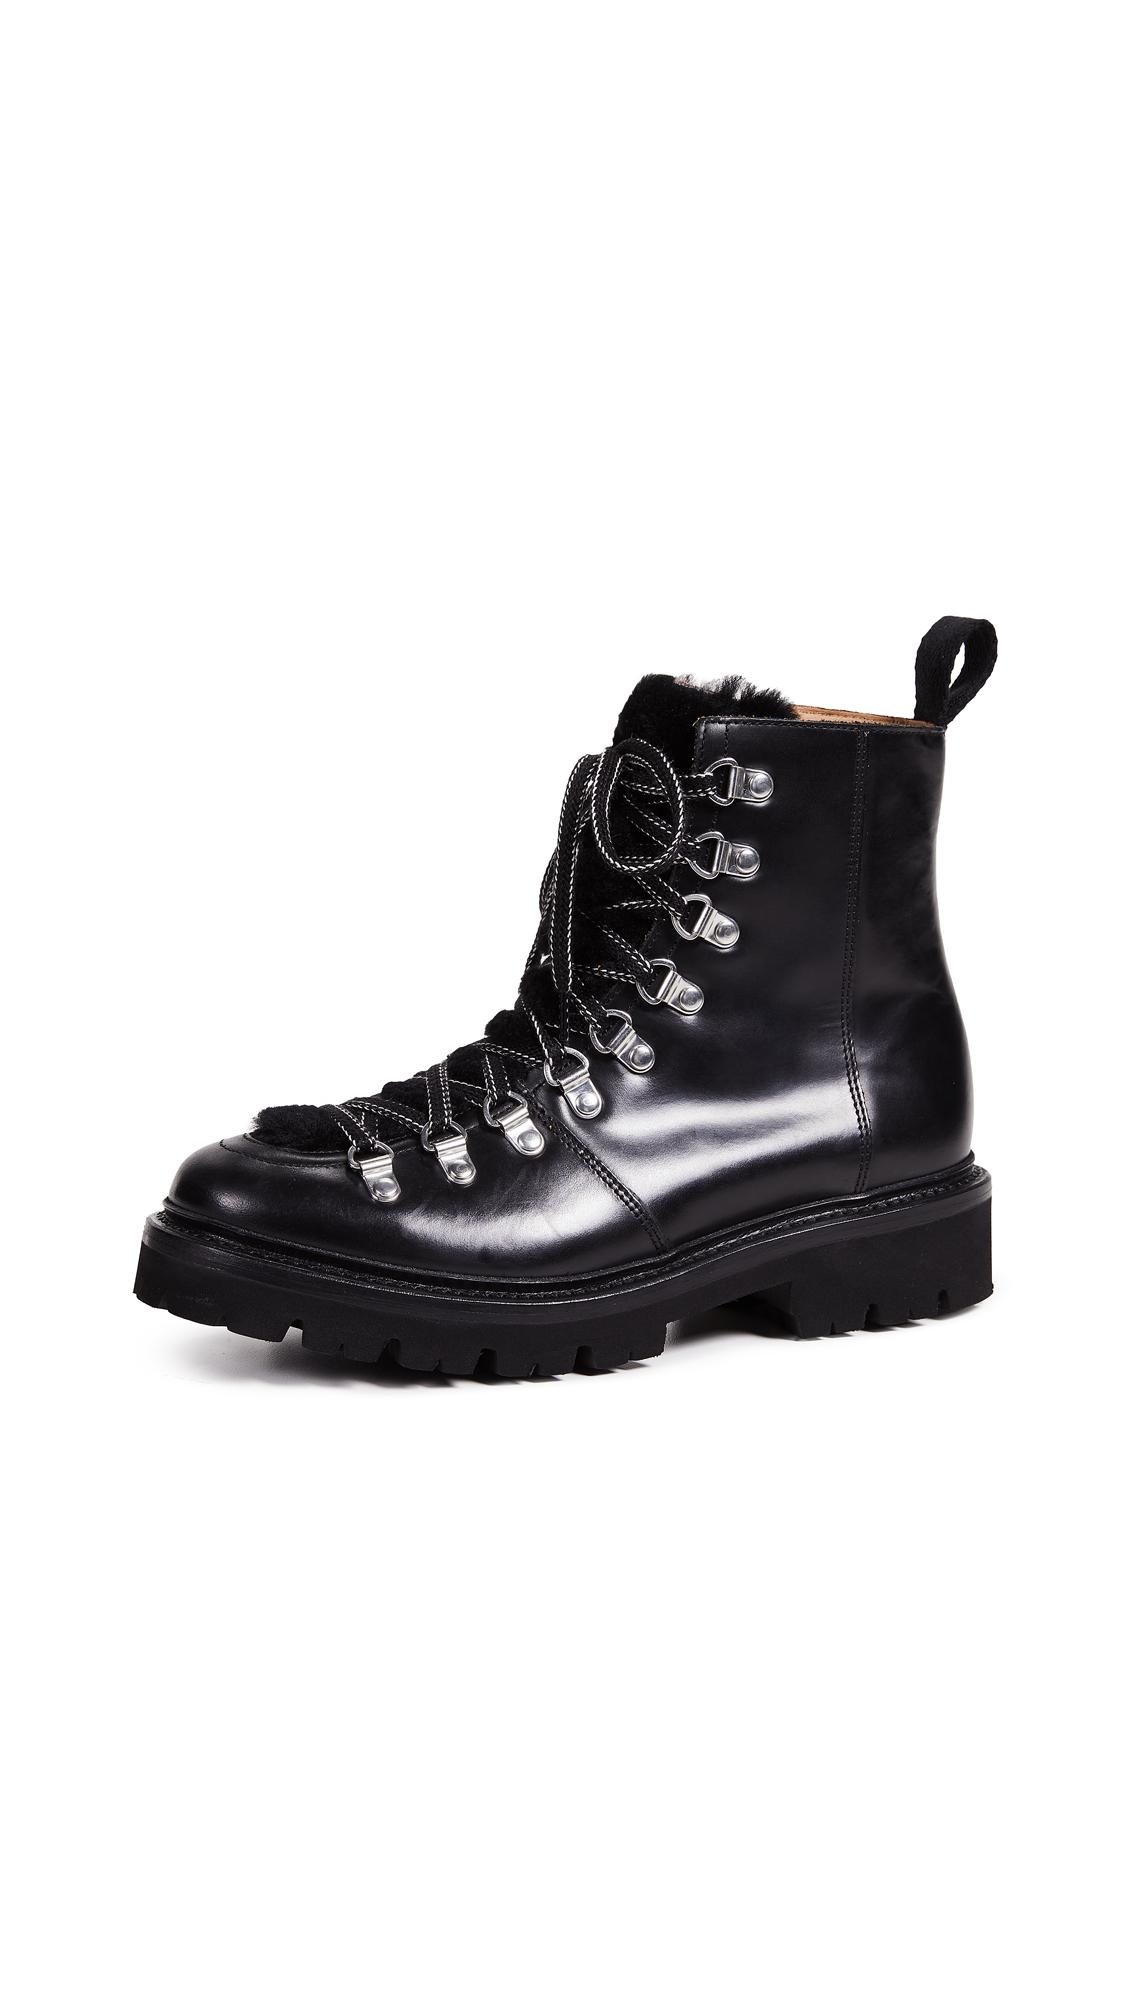 Grenson Nanette Combat Boots - Black/Black